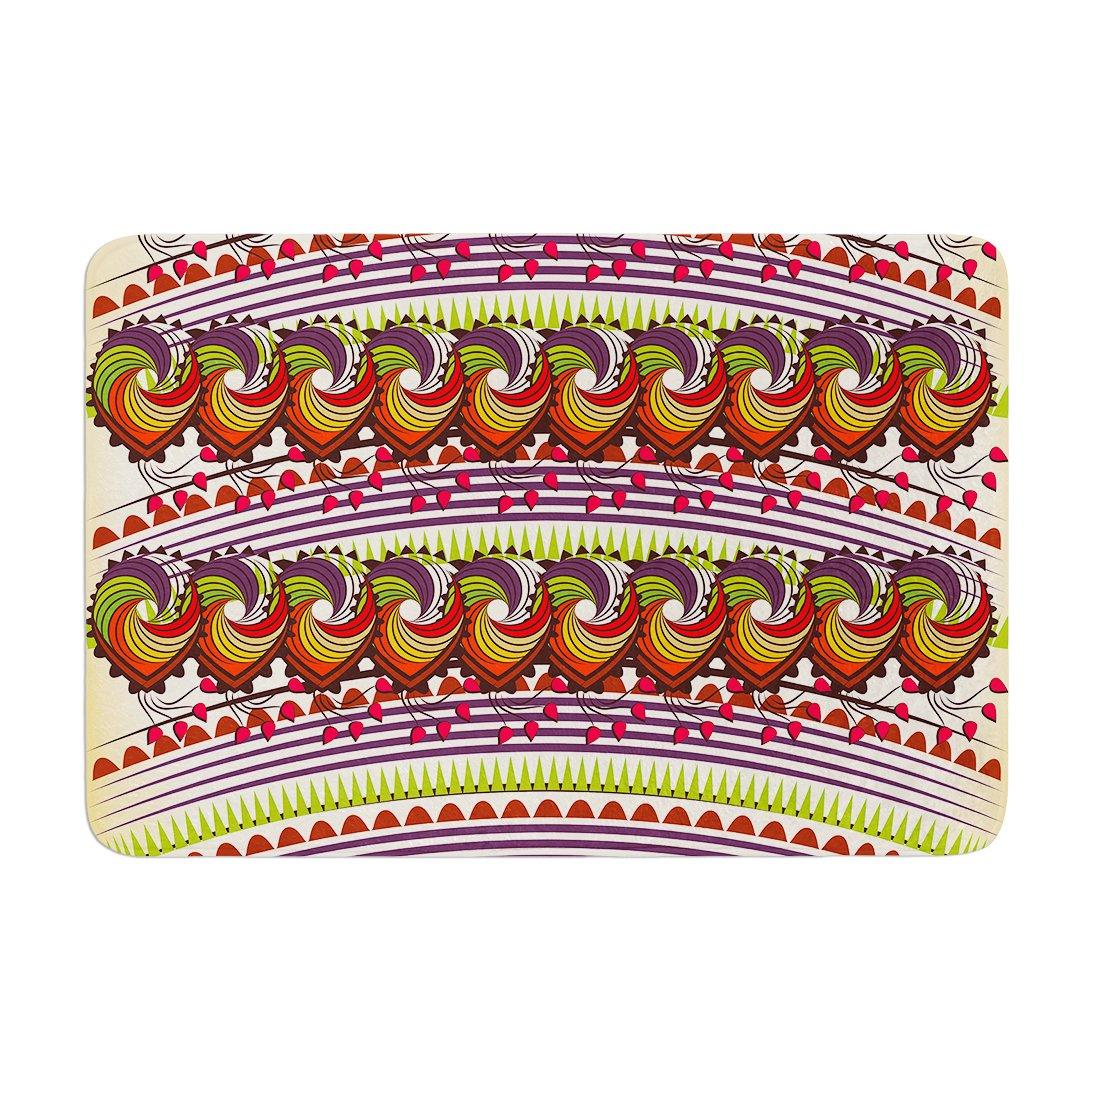 17 by 24 Kess InHouse Famenxt Colorful Traditional Pattern Multicolor Digital Memory Foam/Bath Mat